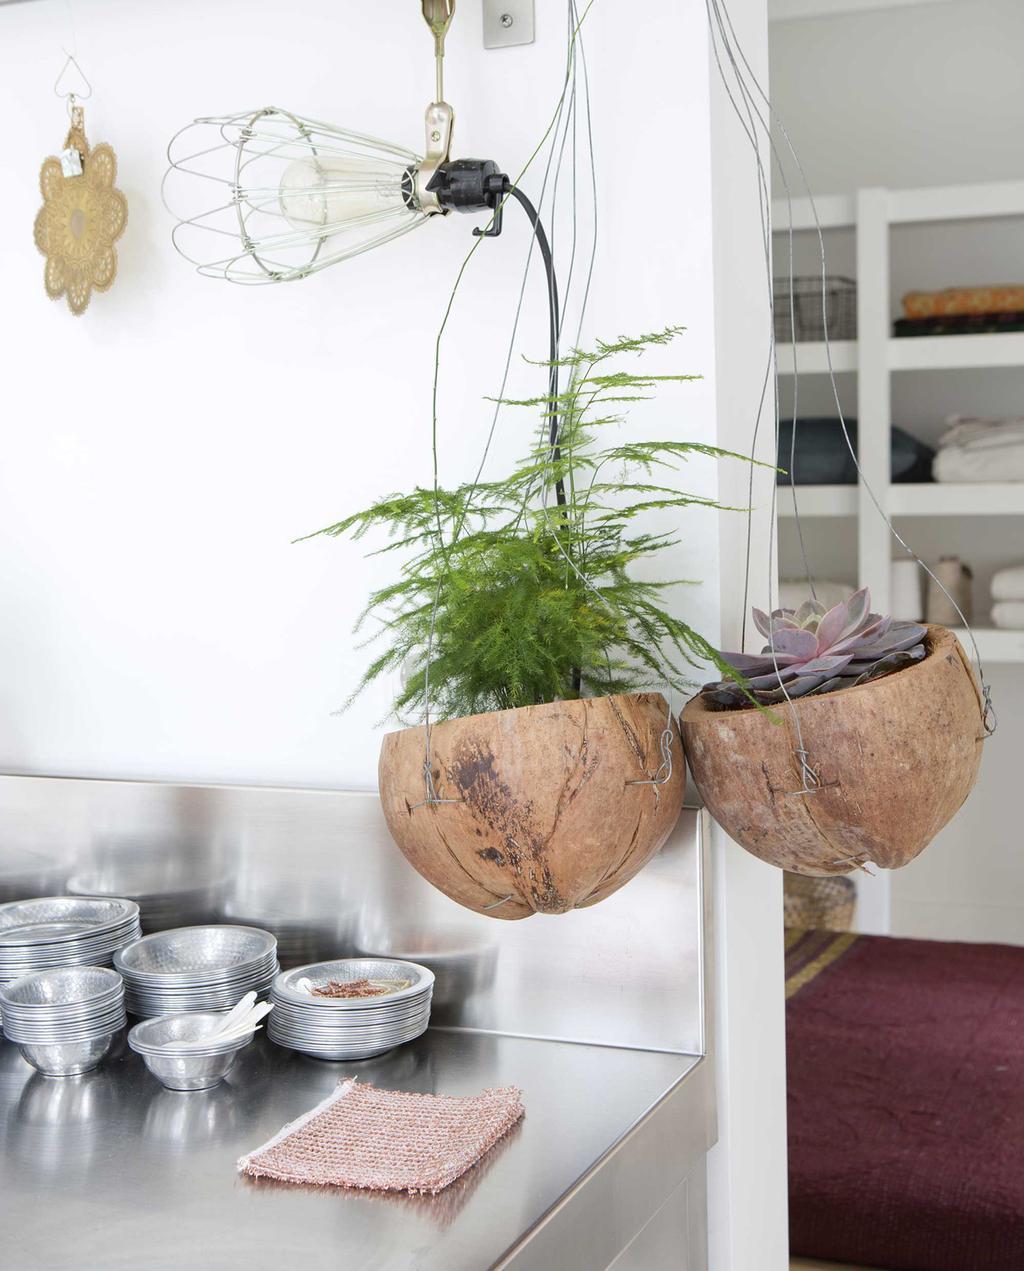 kokosnoot plantenbakken